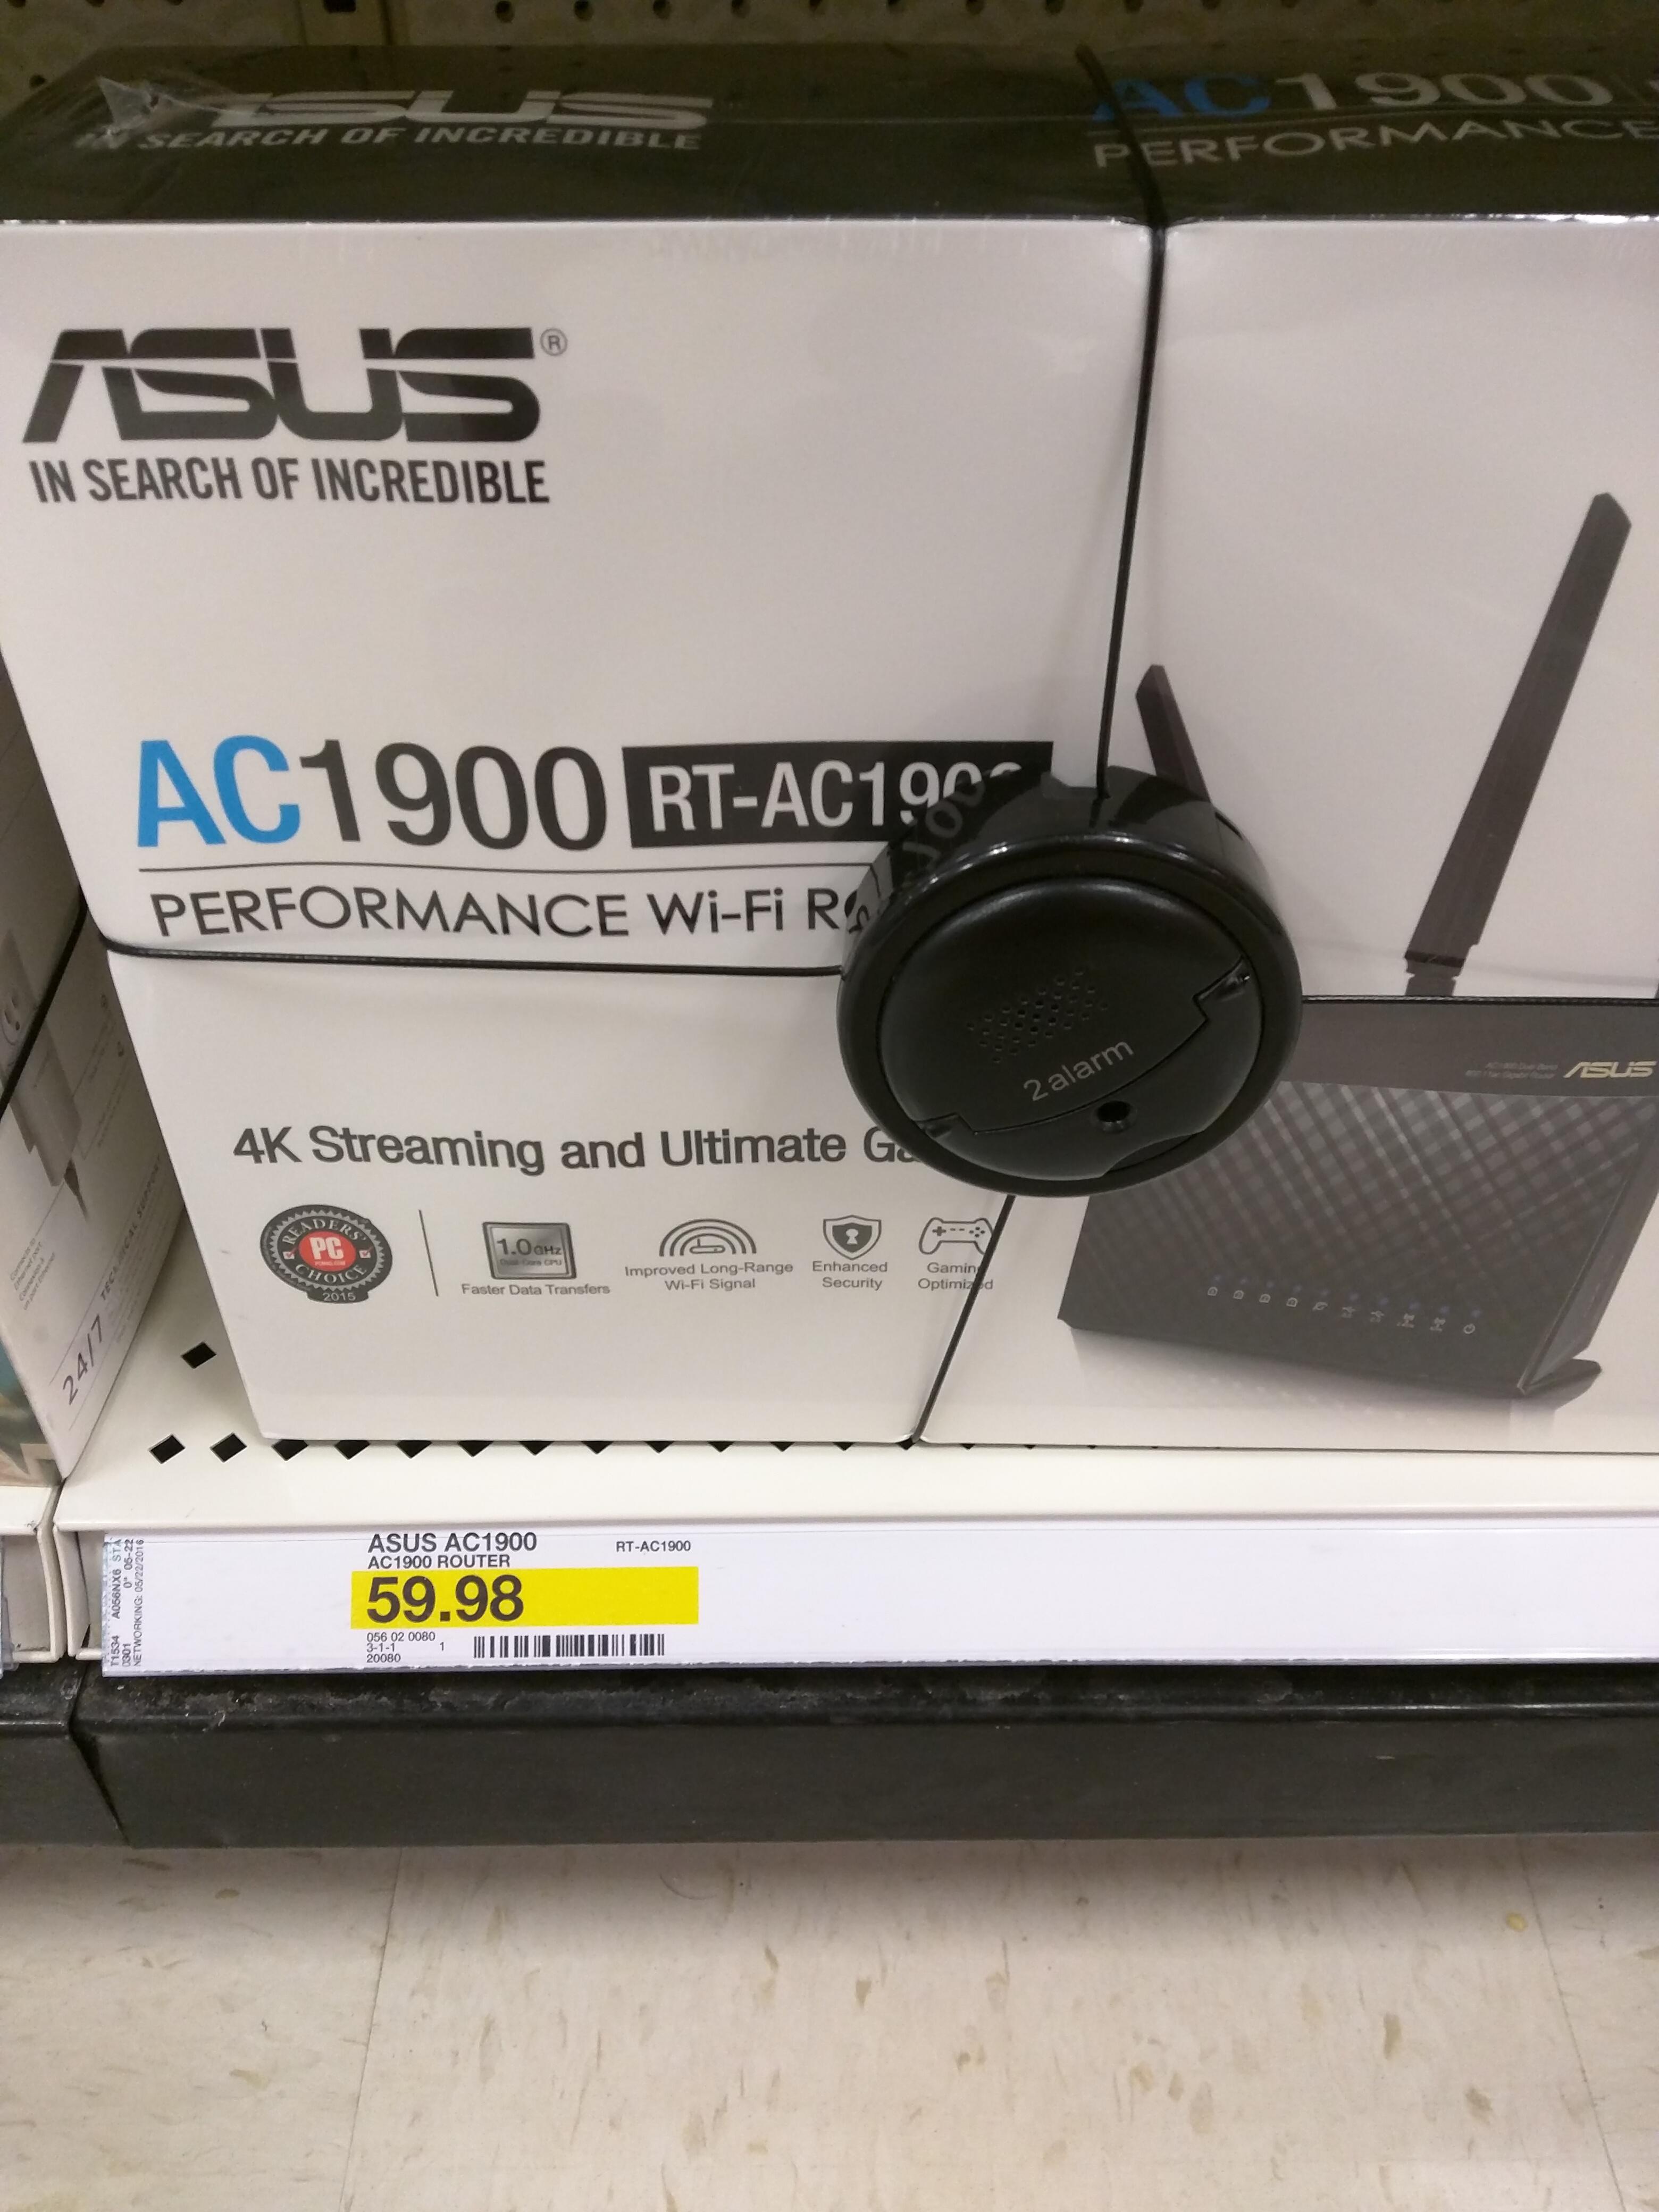 Target Asus RT-AC1900 (RT-AC68U) $59.98 HUGE YMMV